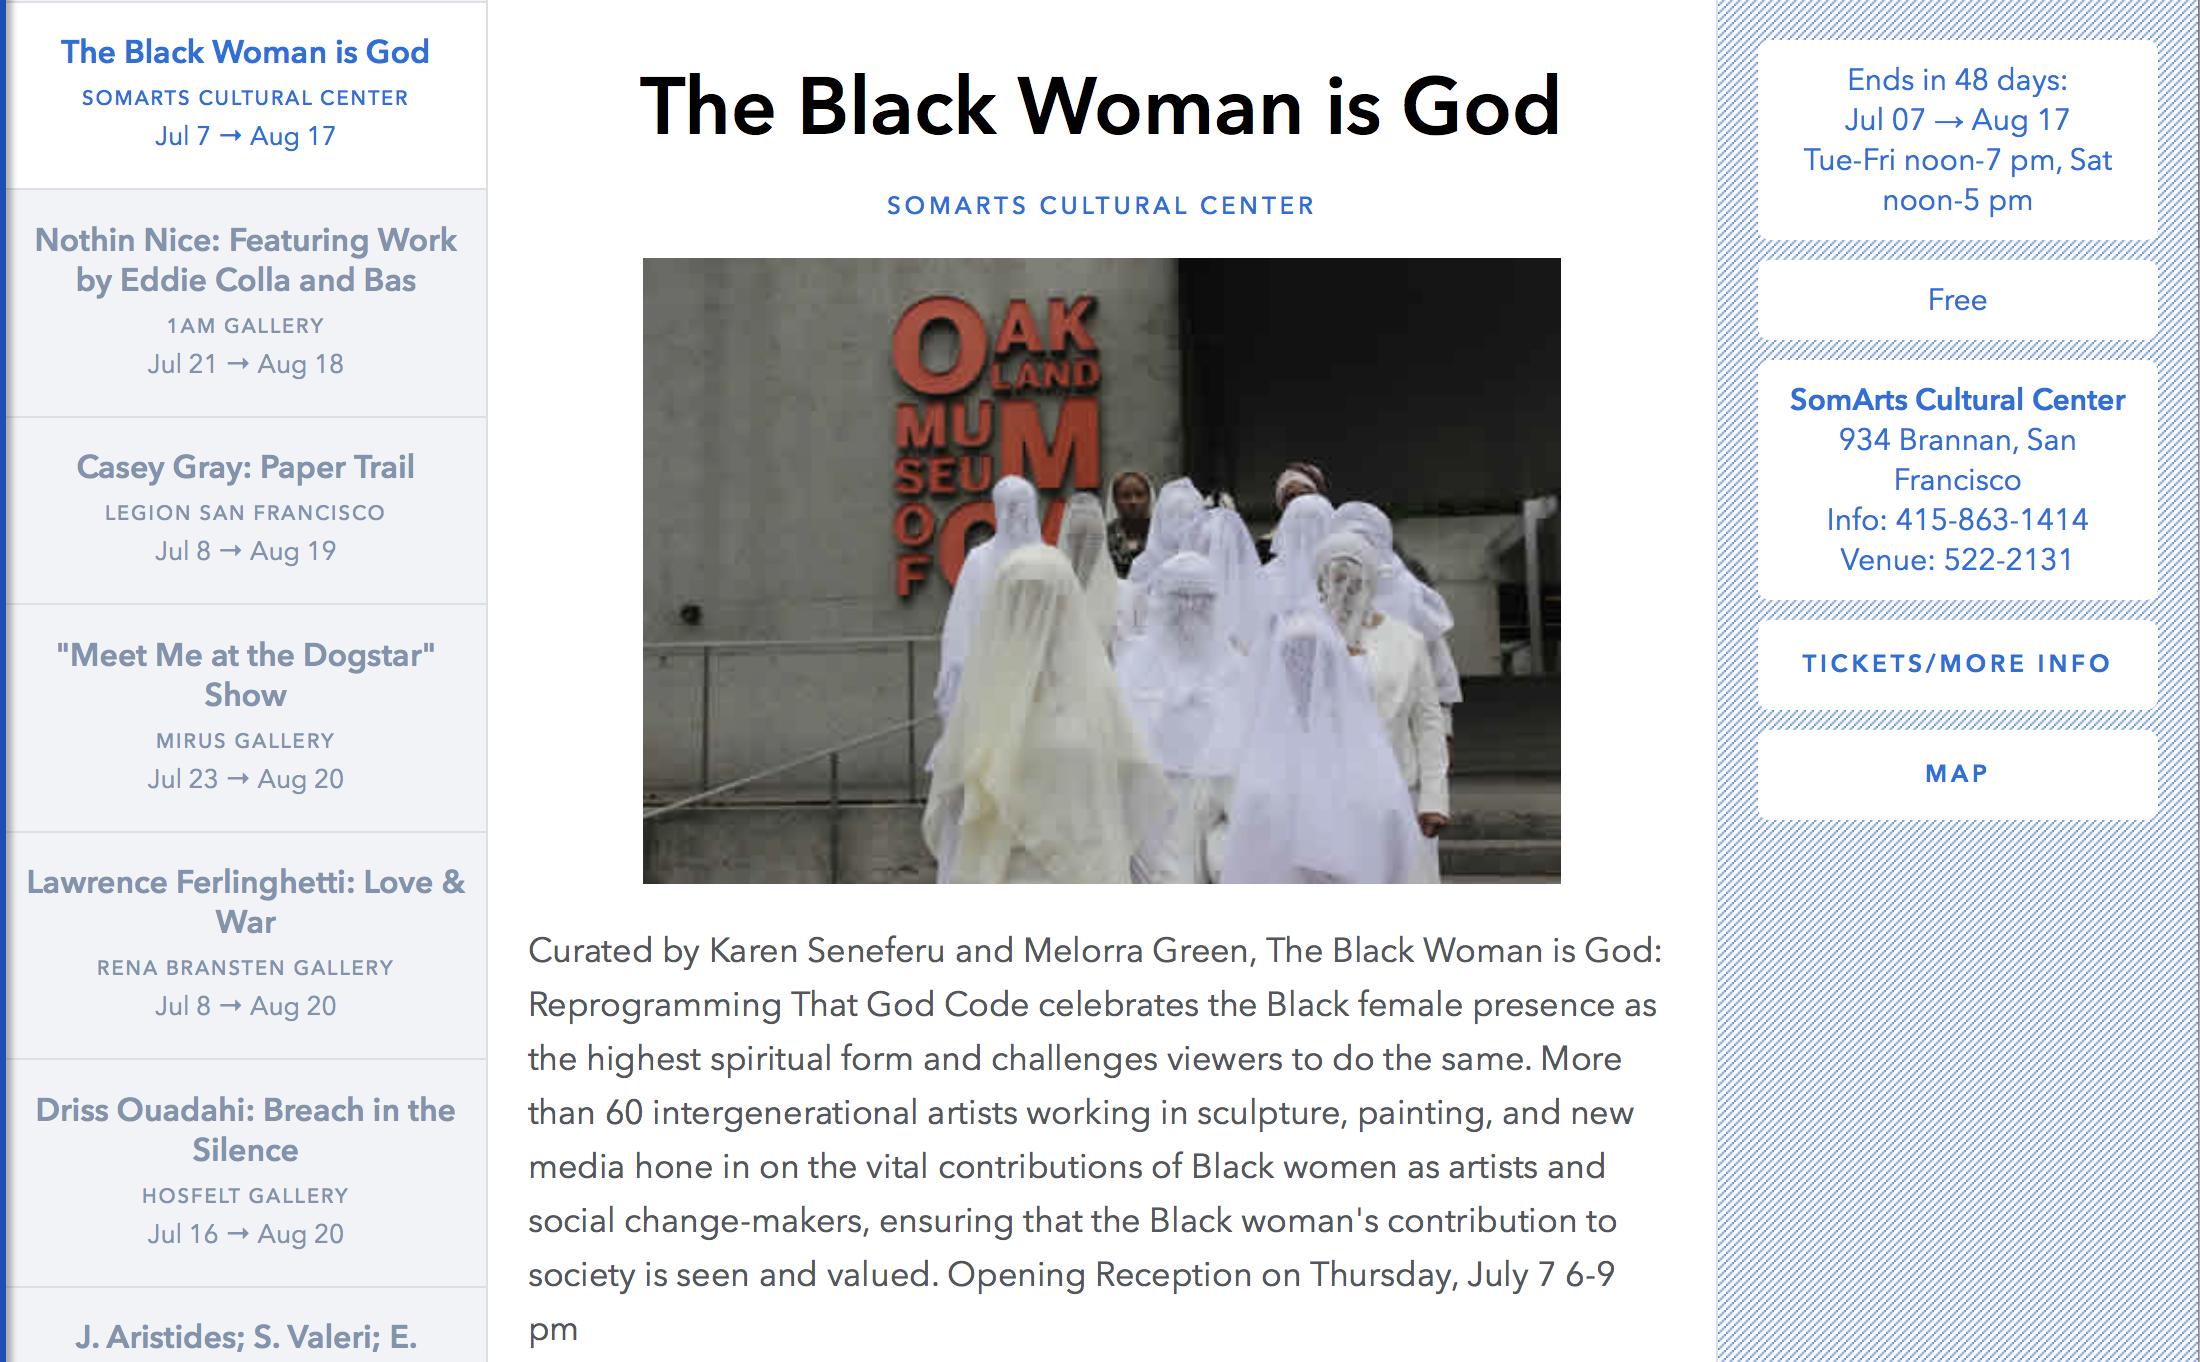 SF/Arts Media, LLC. SF/Arts Monthly.  The Black Woman Is God  .  July Galleries  . SF/Arts Media, LLC, n.d. Web. <http://sfarts.org/event.cfm?event_num=68189>